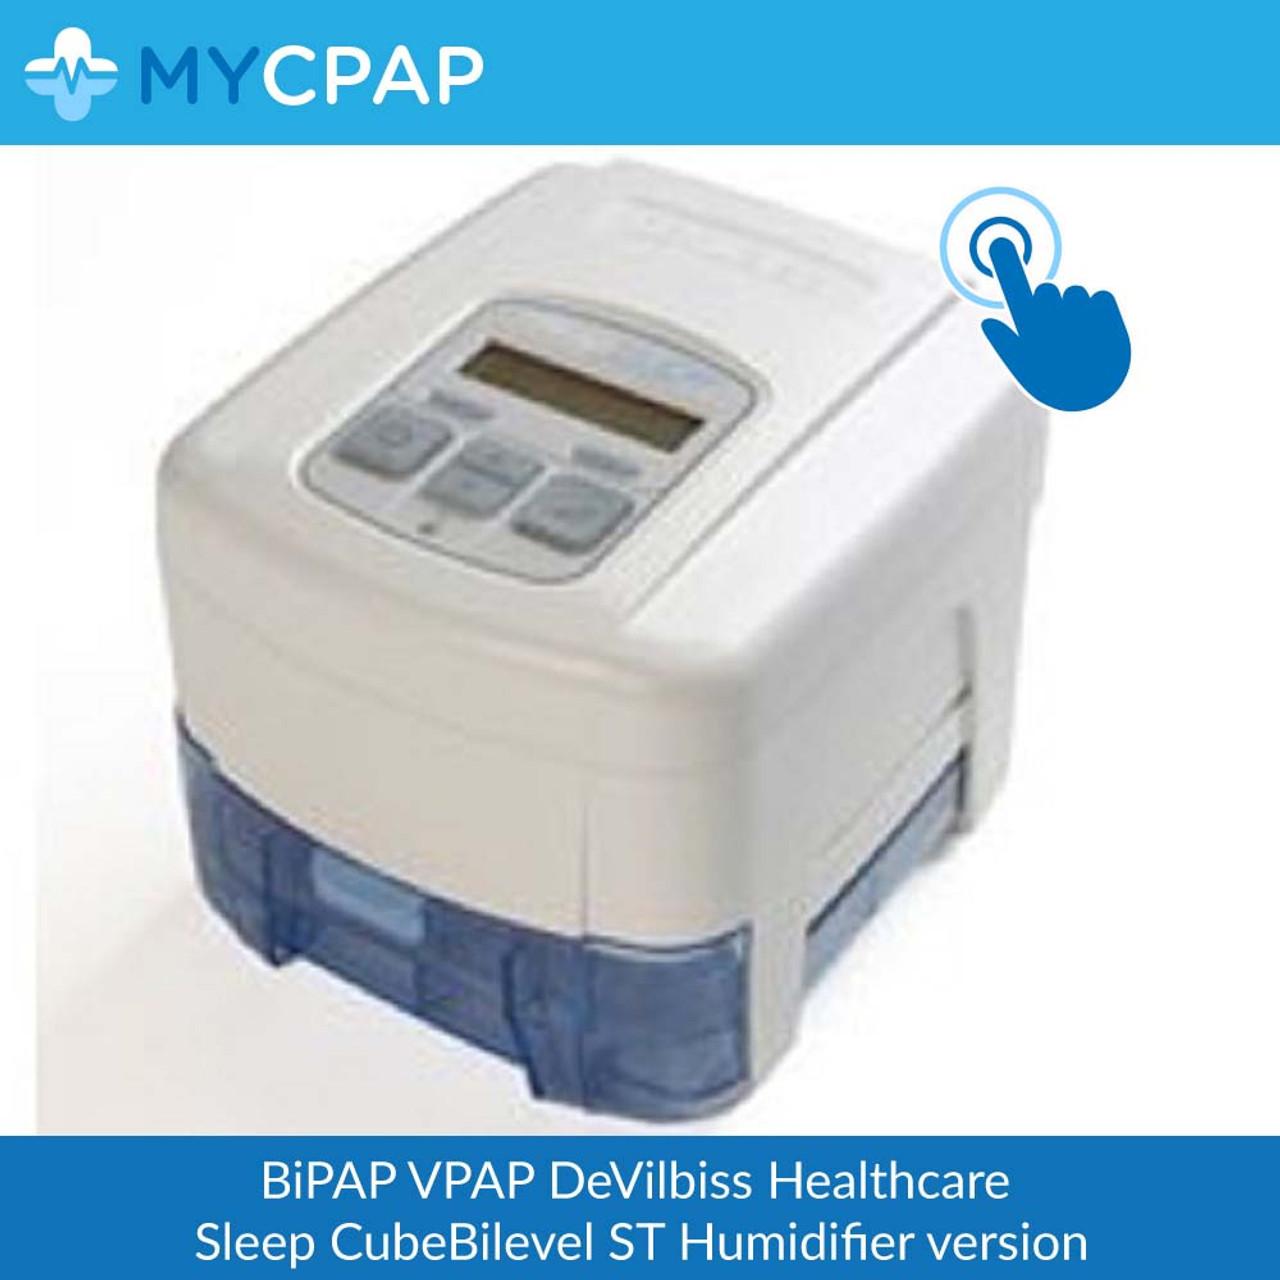 DeVilbiss Healthcare-Sleep CubeBilevel ST (humidifier version)